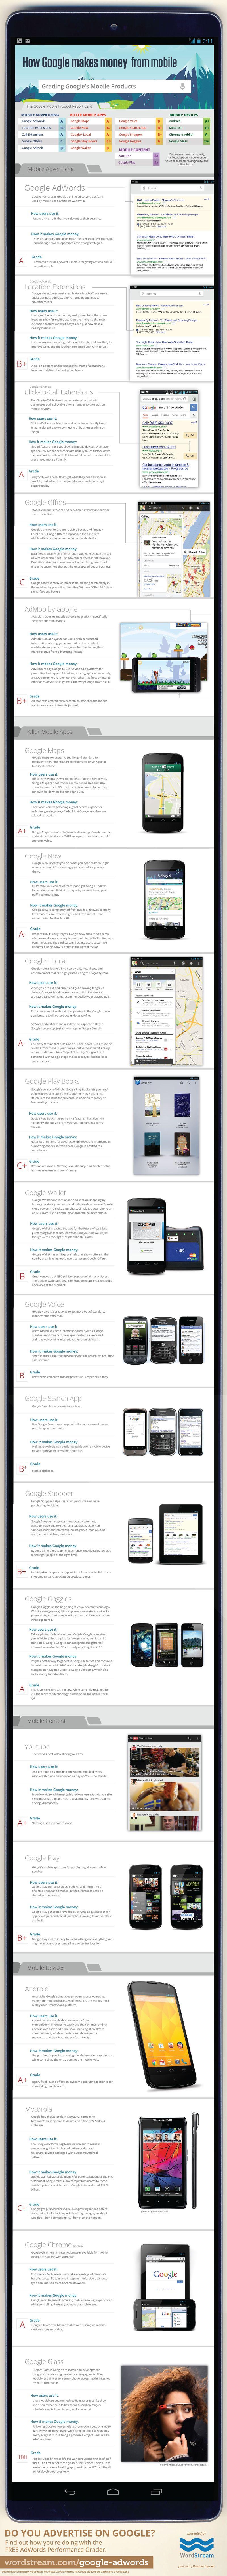 Google-mobile